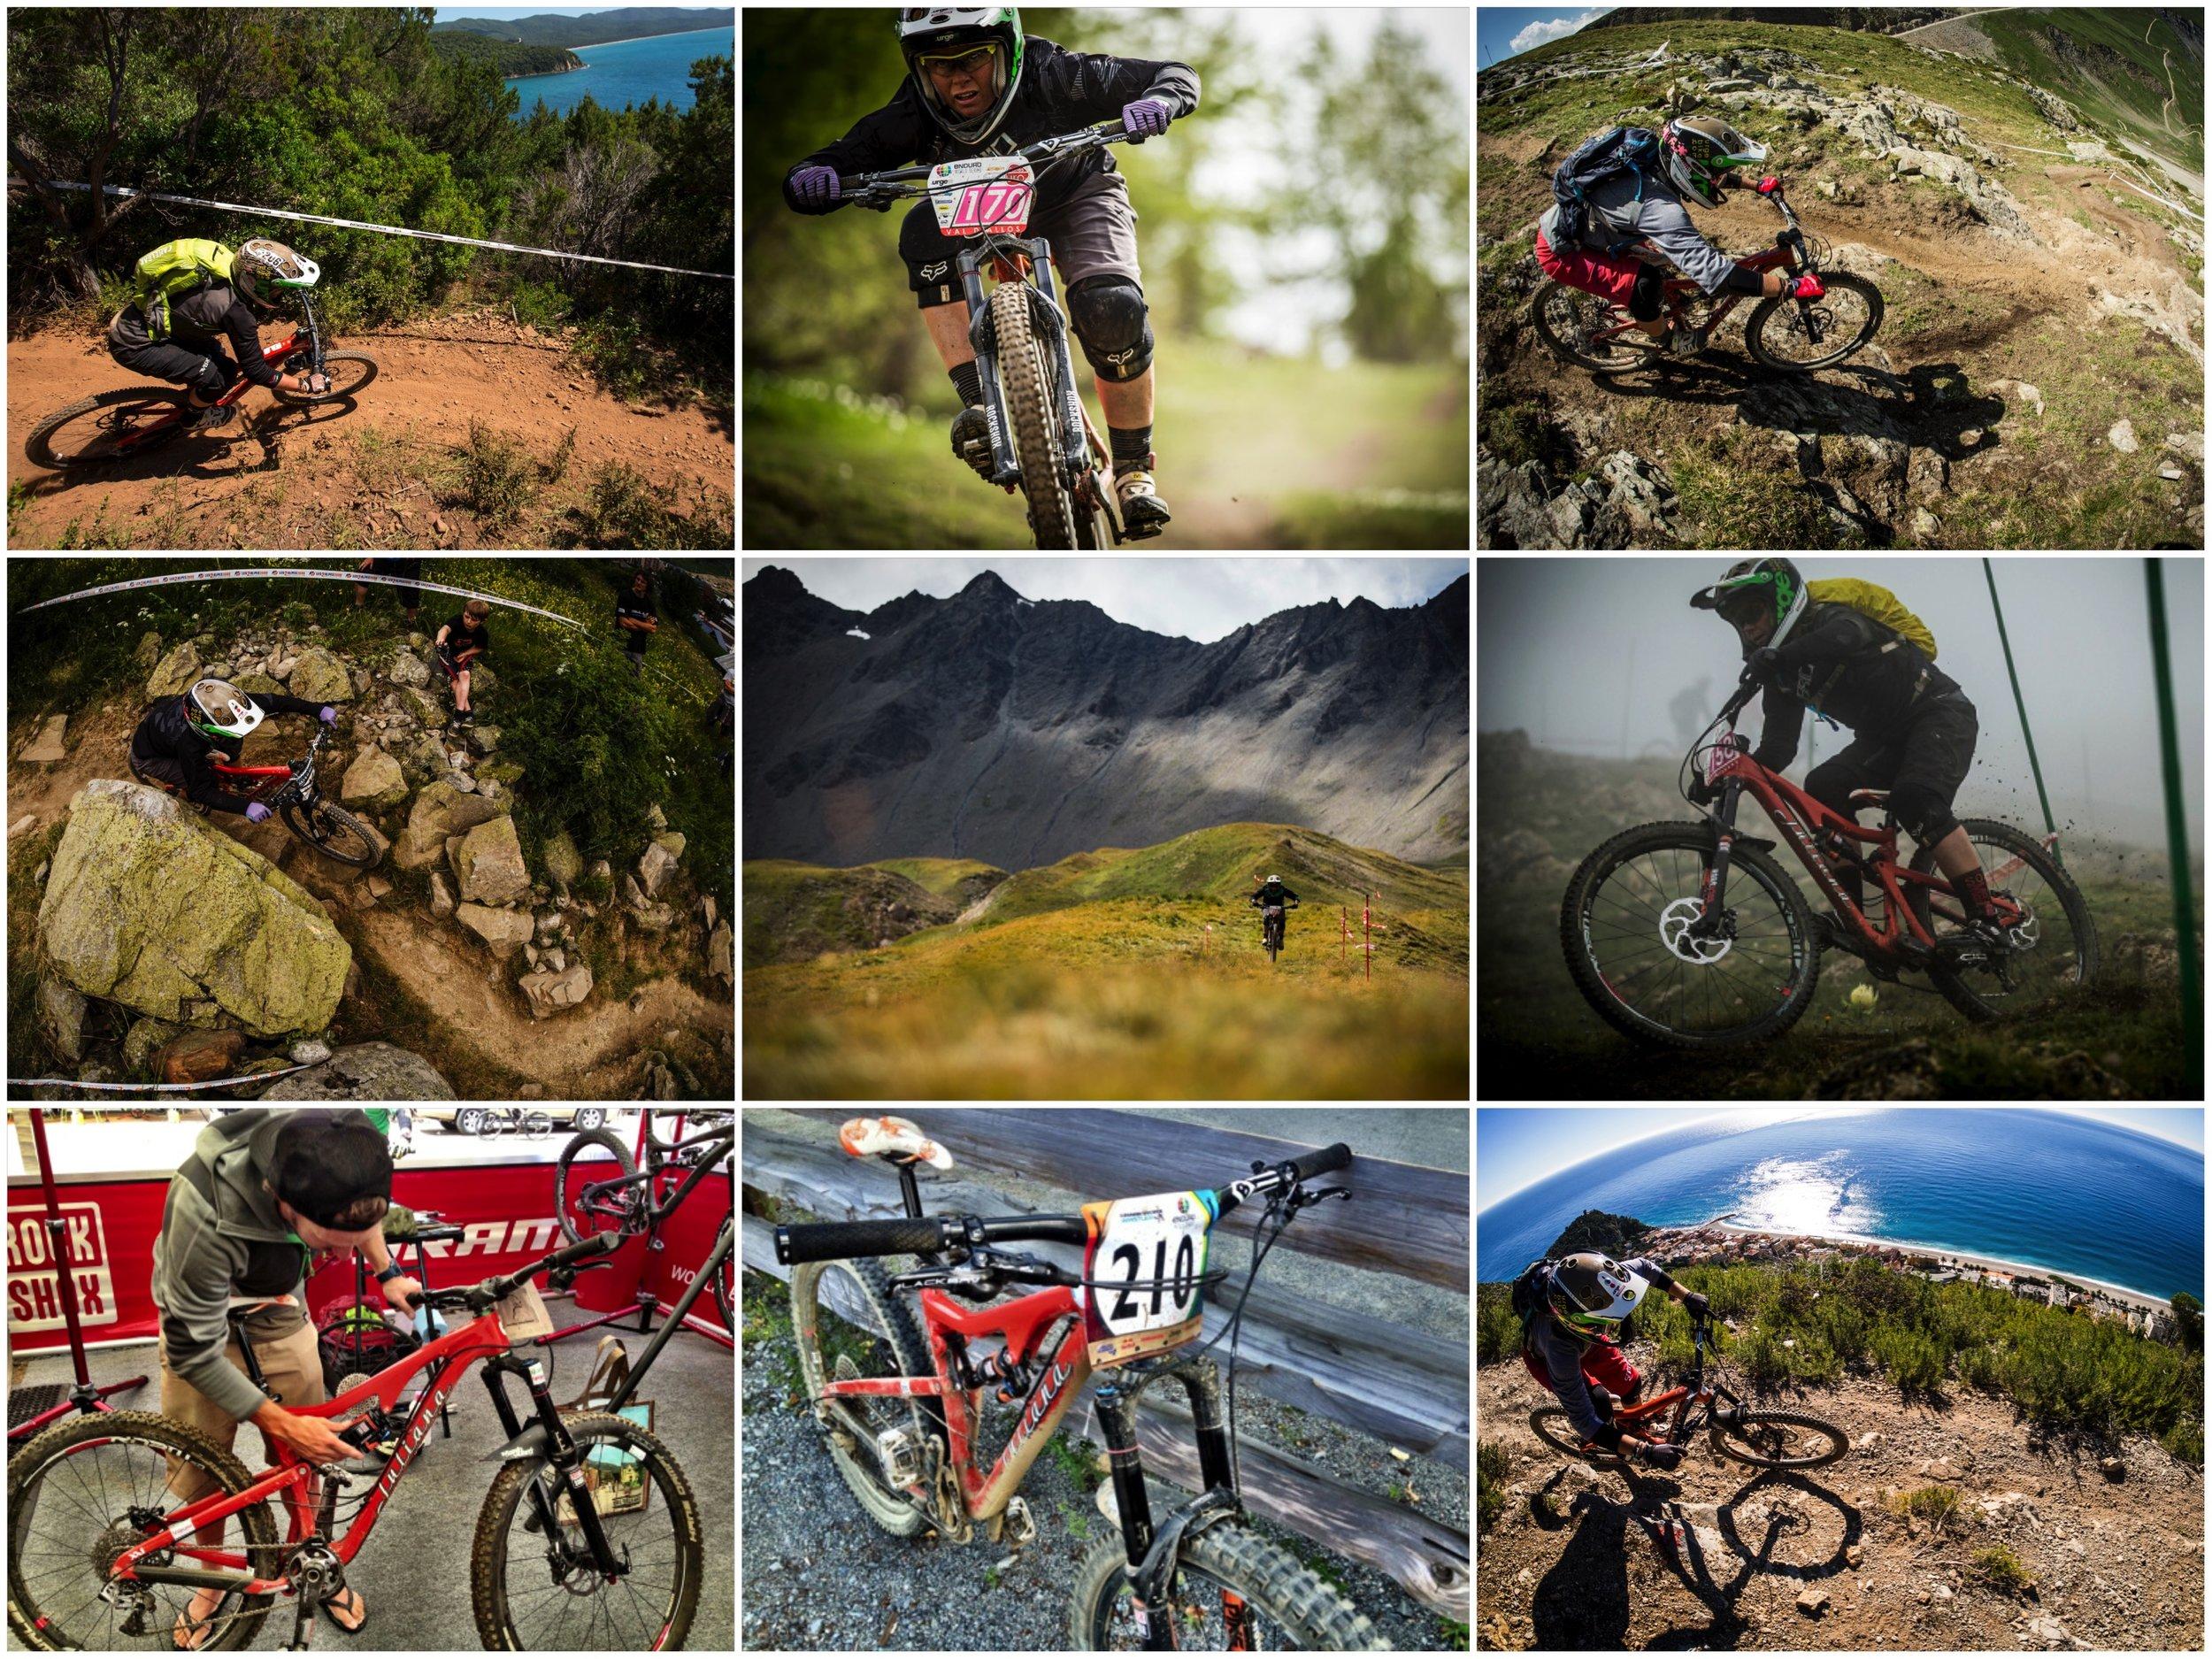 2013 EWS Season:      Punta Ala Italy, Val D'Allos France, Les Deux Alpes France,    Val D'Isere France, Winter Park CO, Whistler Canada, Finale Ligure, Italy.